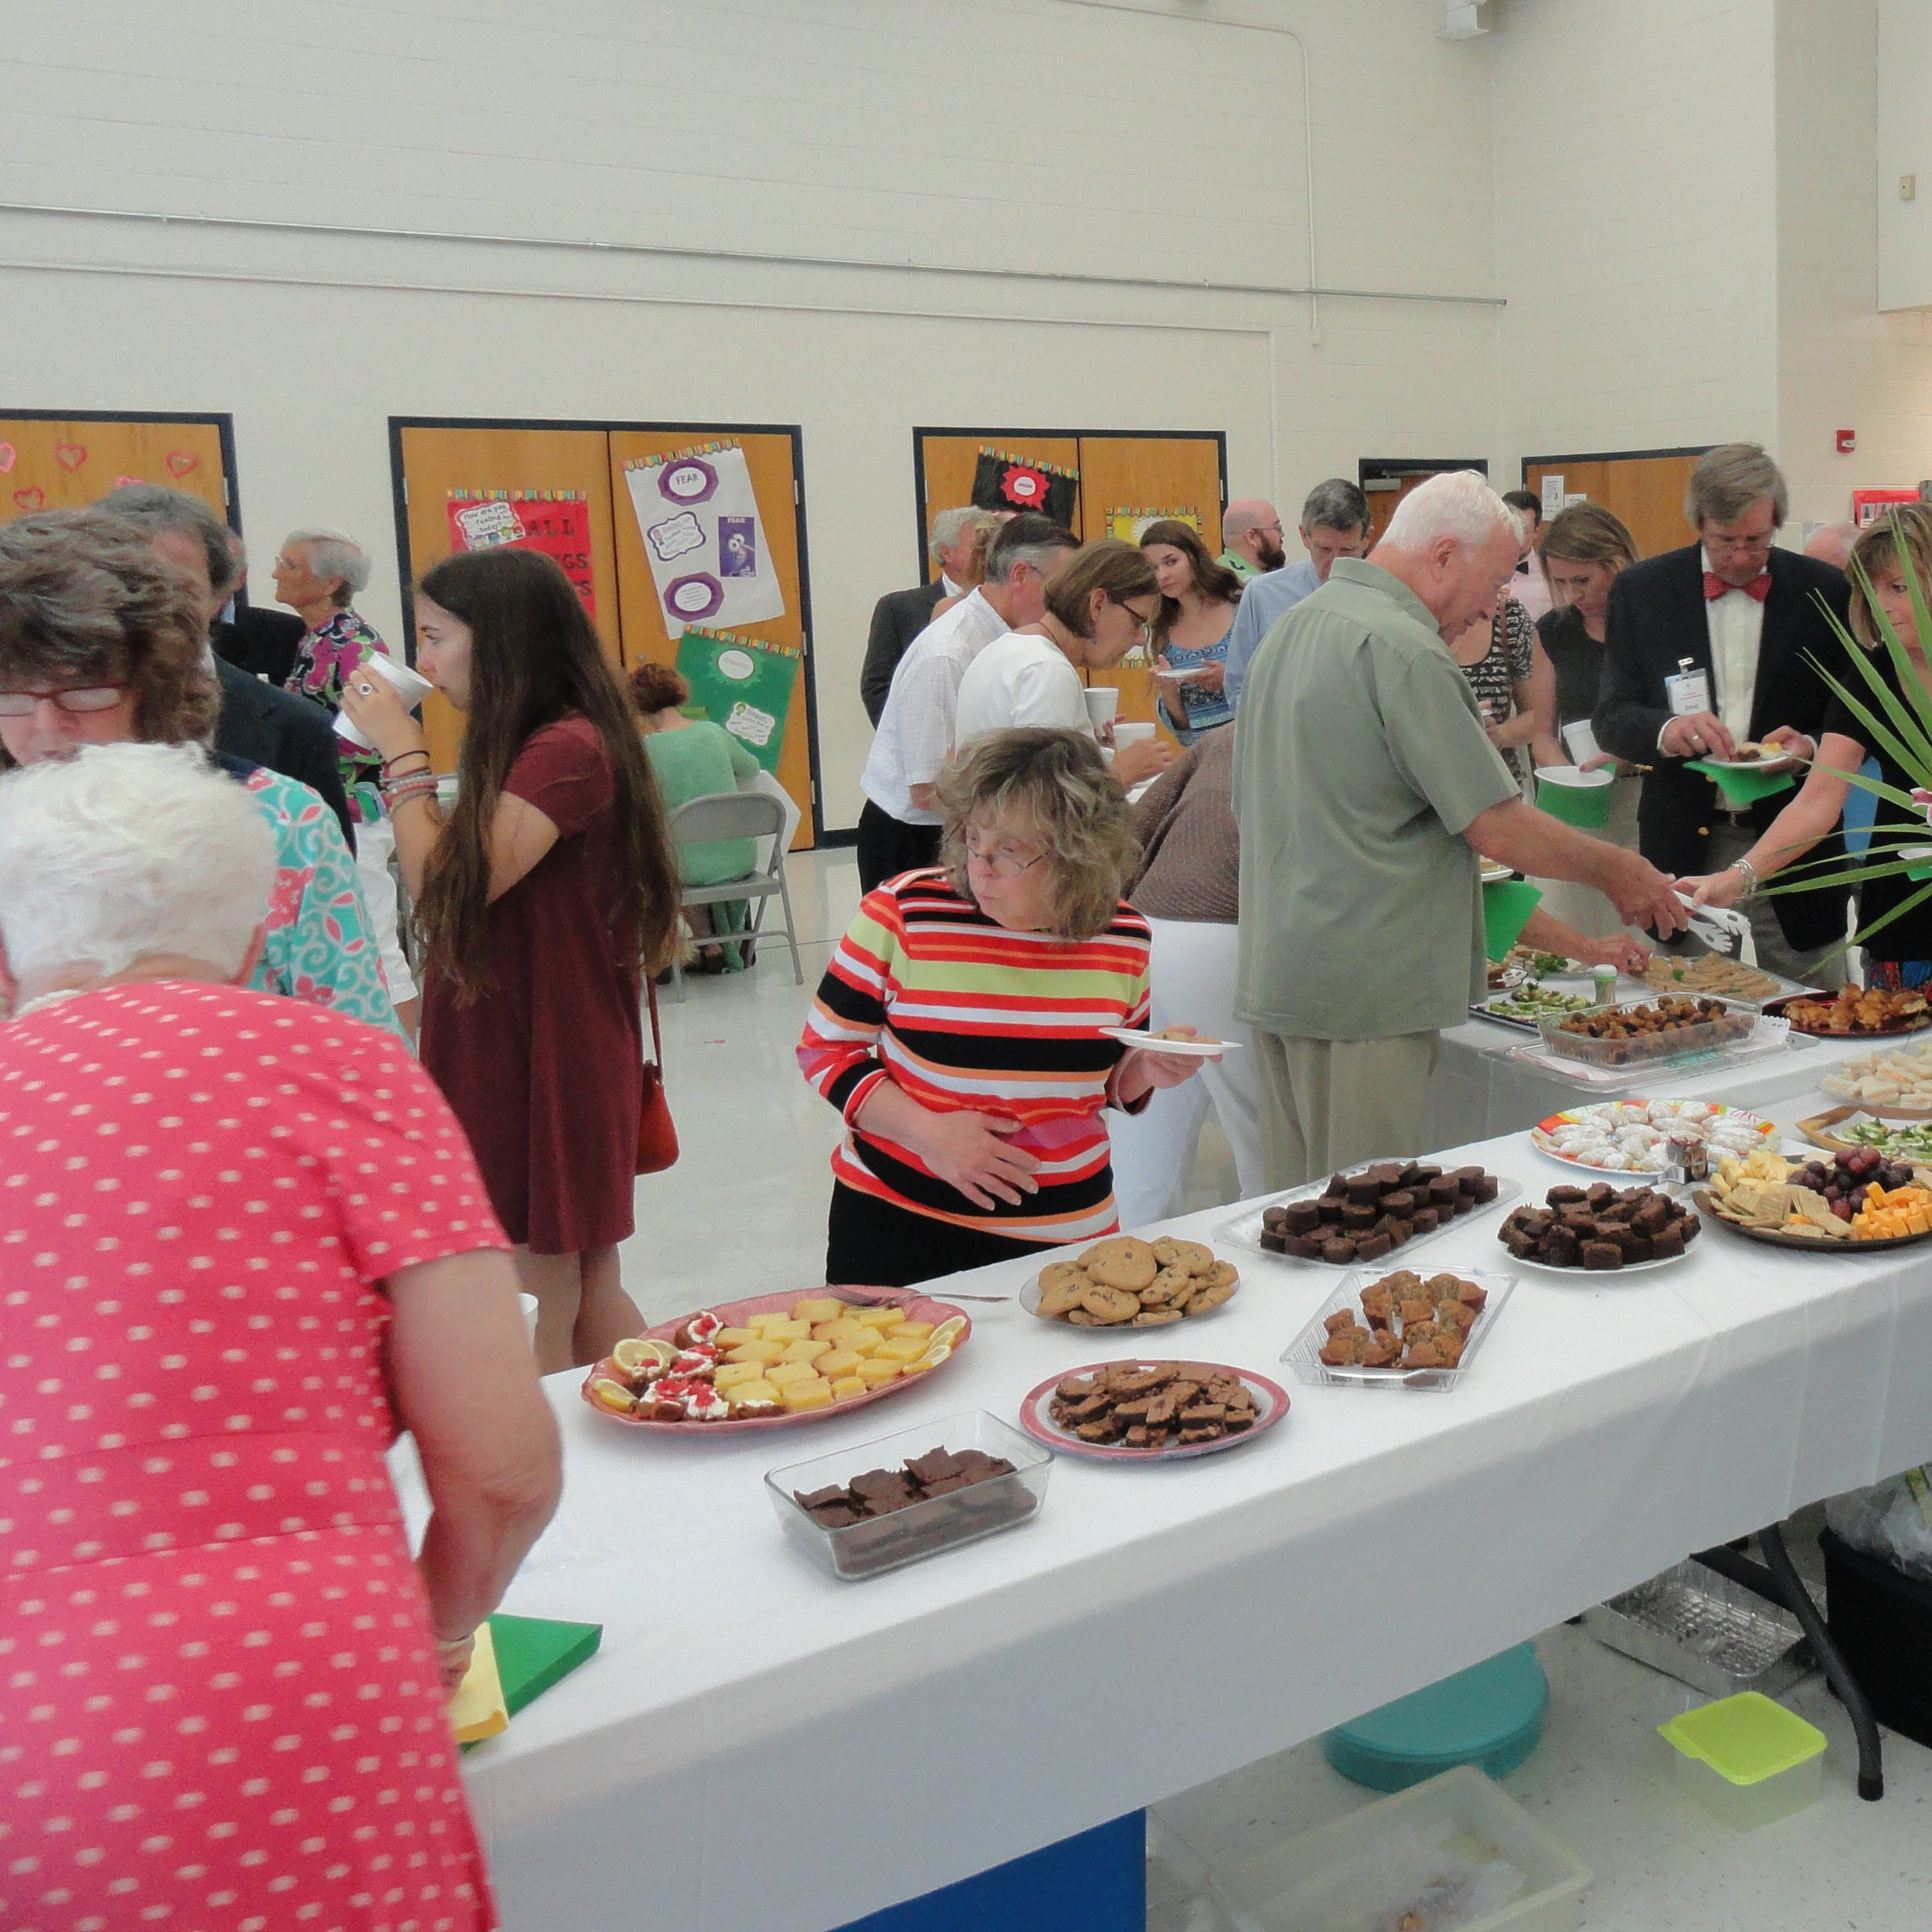 Bishop's Reception 2017 - food line.JPG